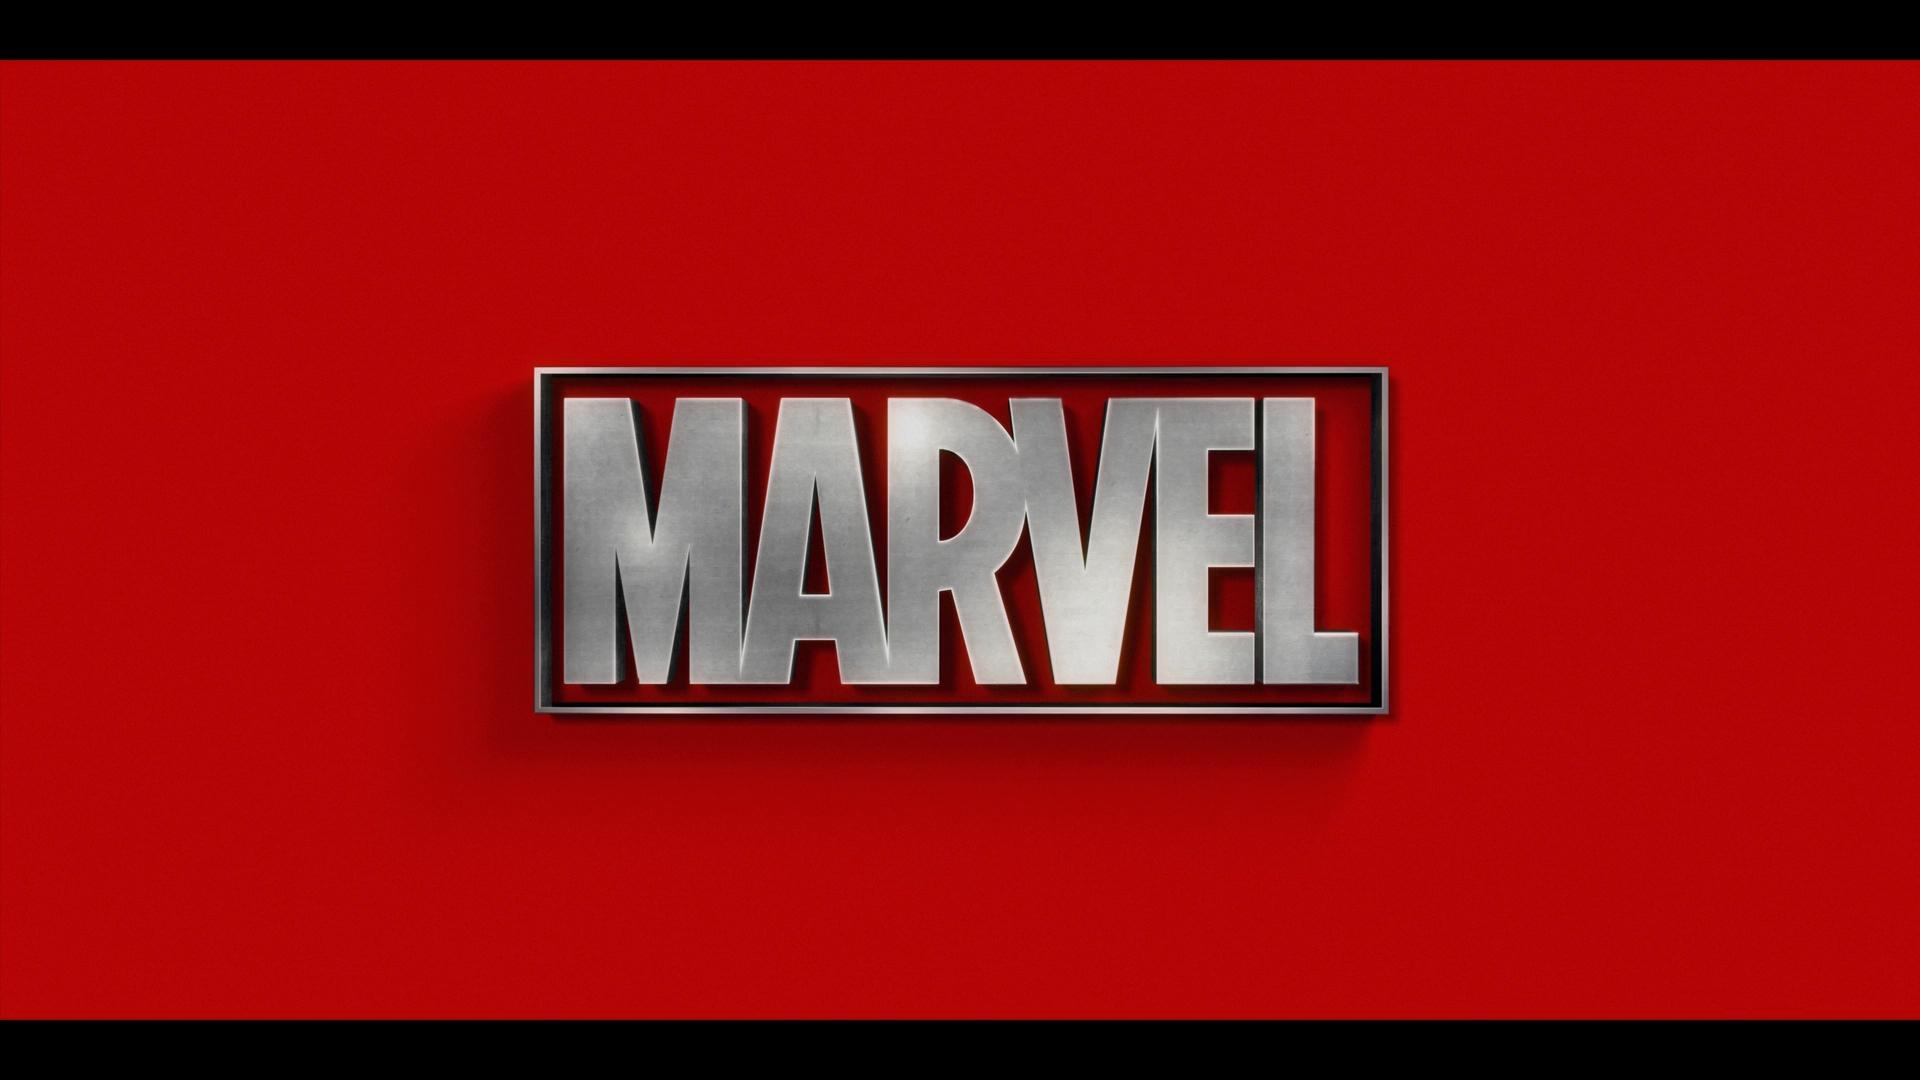 Marvel's 616 (2020) 1080p WEB-DL Latino